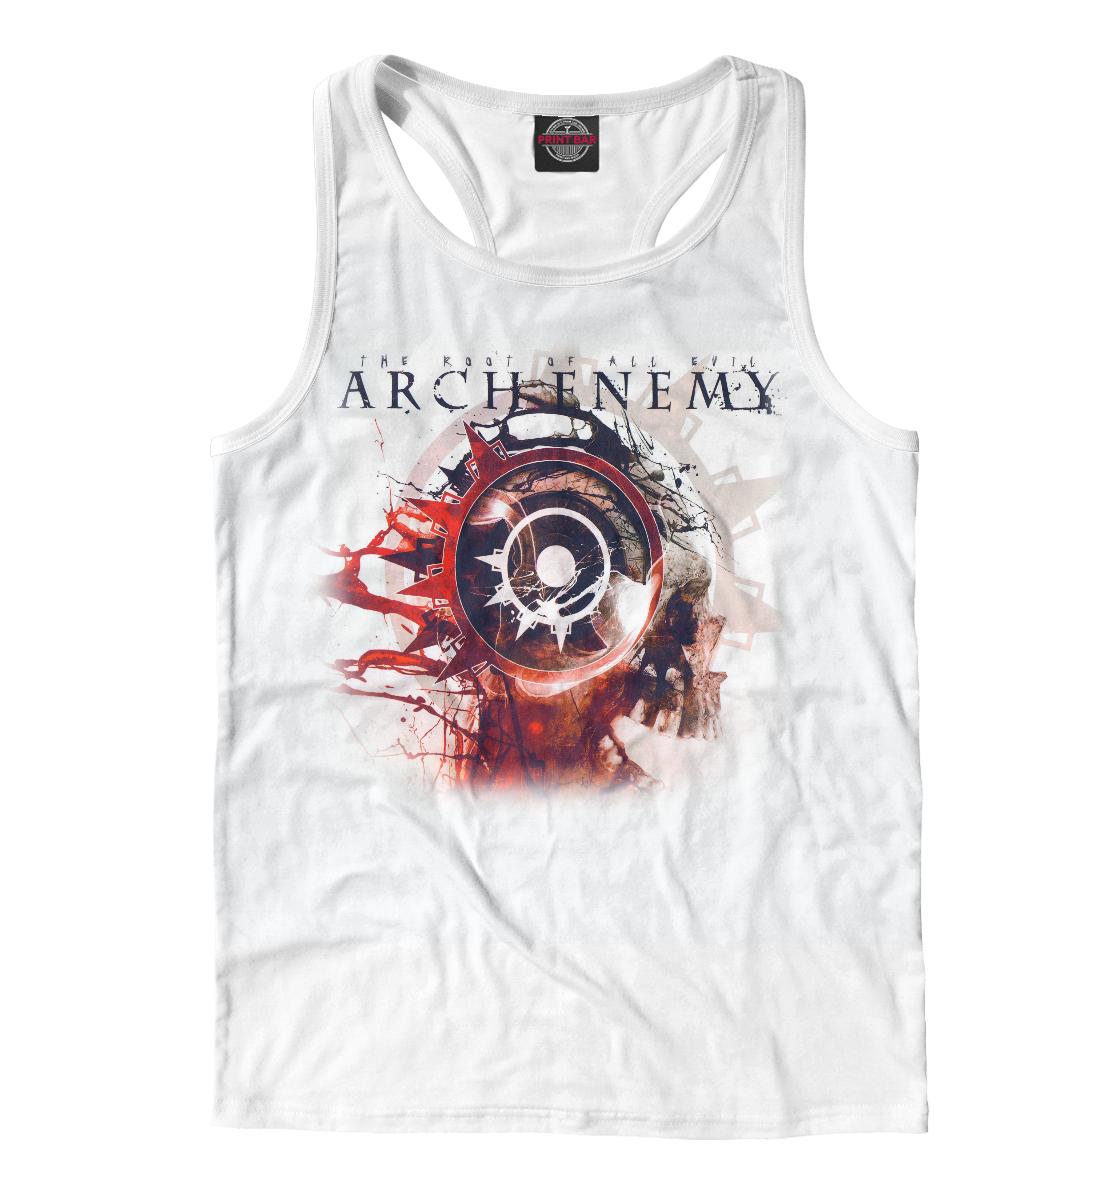 Купить Arch Enemy, Printbar, Майки борцовки, AEN-569564-mayb-2